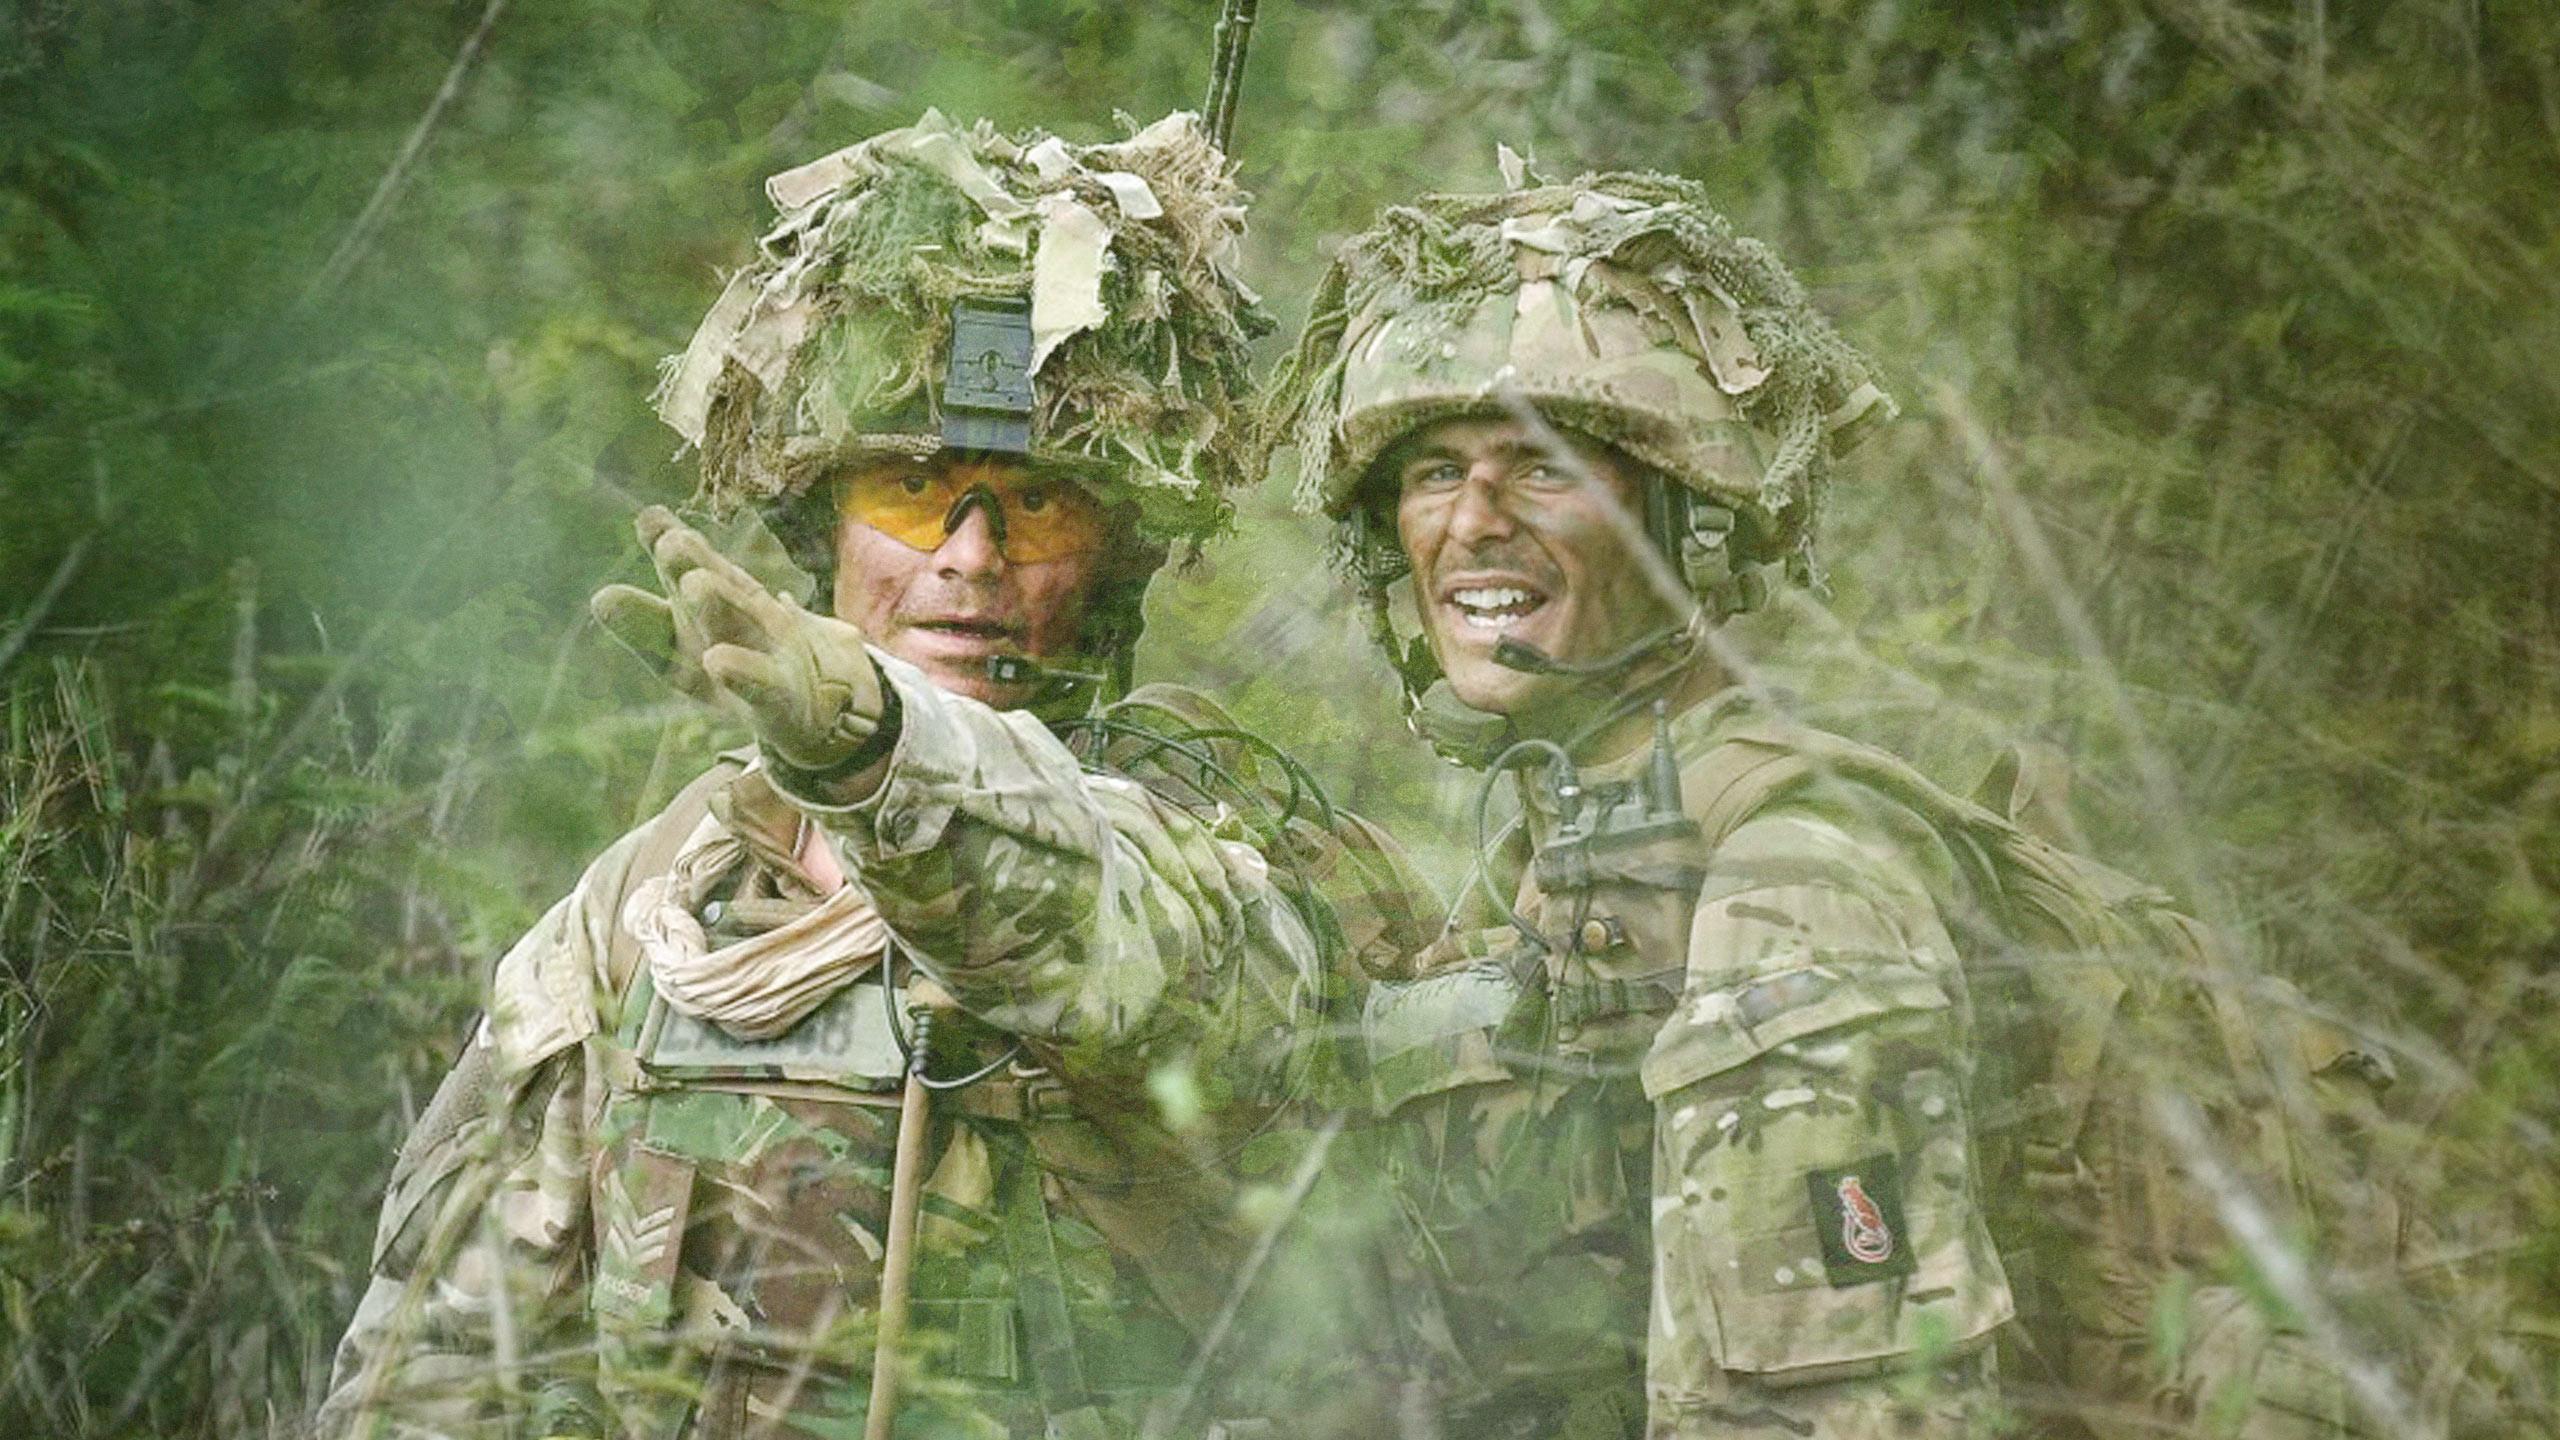 "<p>Коллаж &copy; L!FE. Фото &copy; <a href=""https://www.flickr.com/photos/defenceimages/8614177412/"" target=""_blank"">Flickr/Defence Images</a></p>"